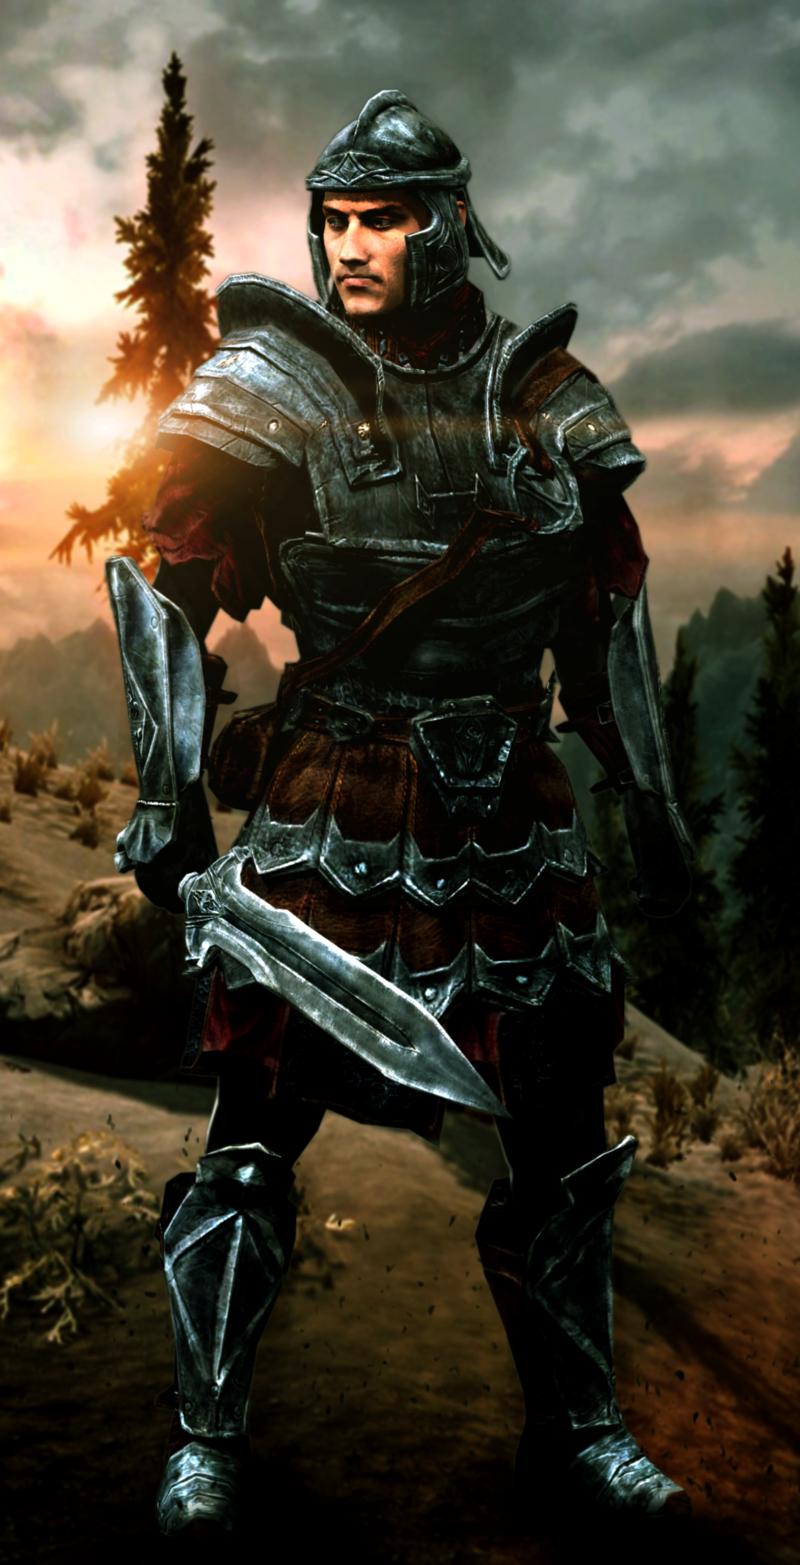 Imperial Legion Oblivion imperial legion armor ...